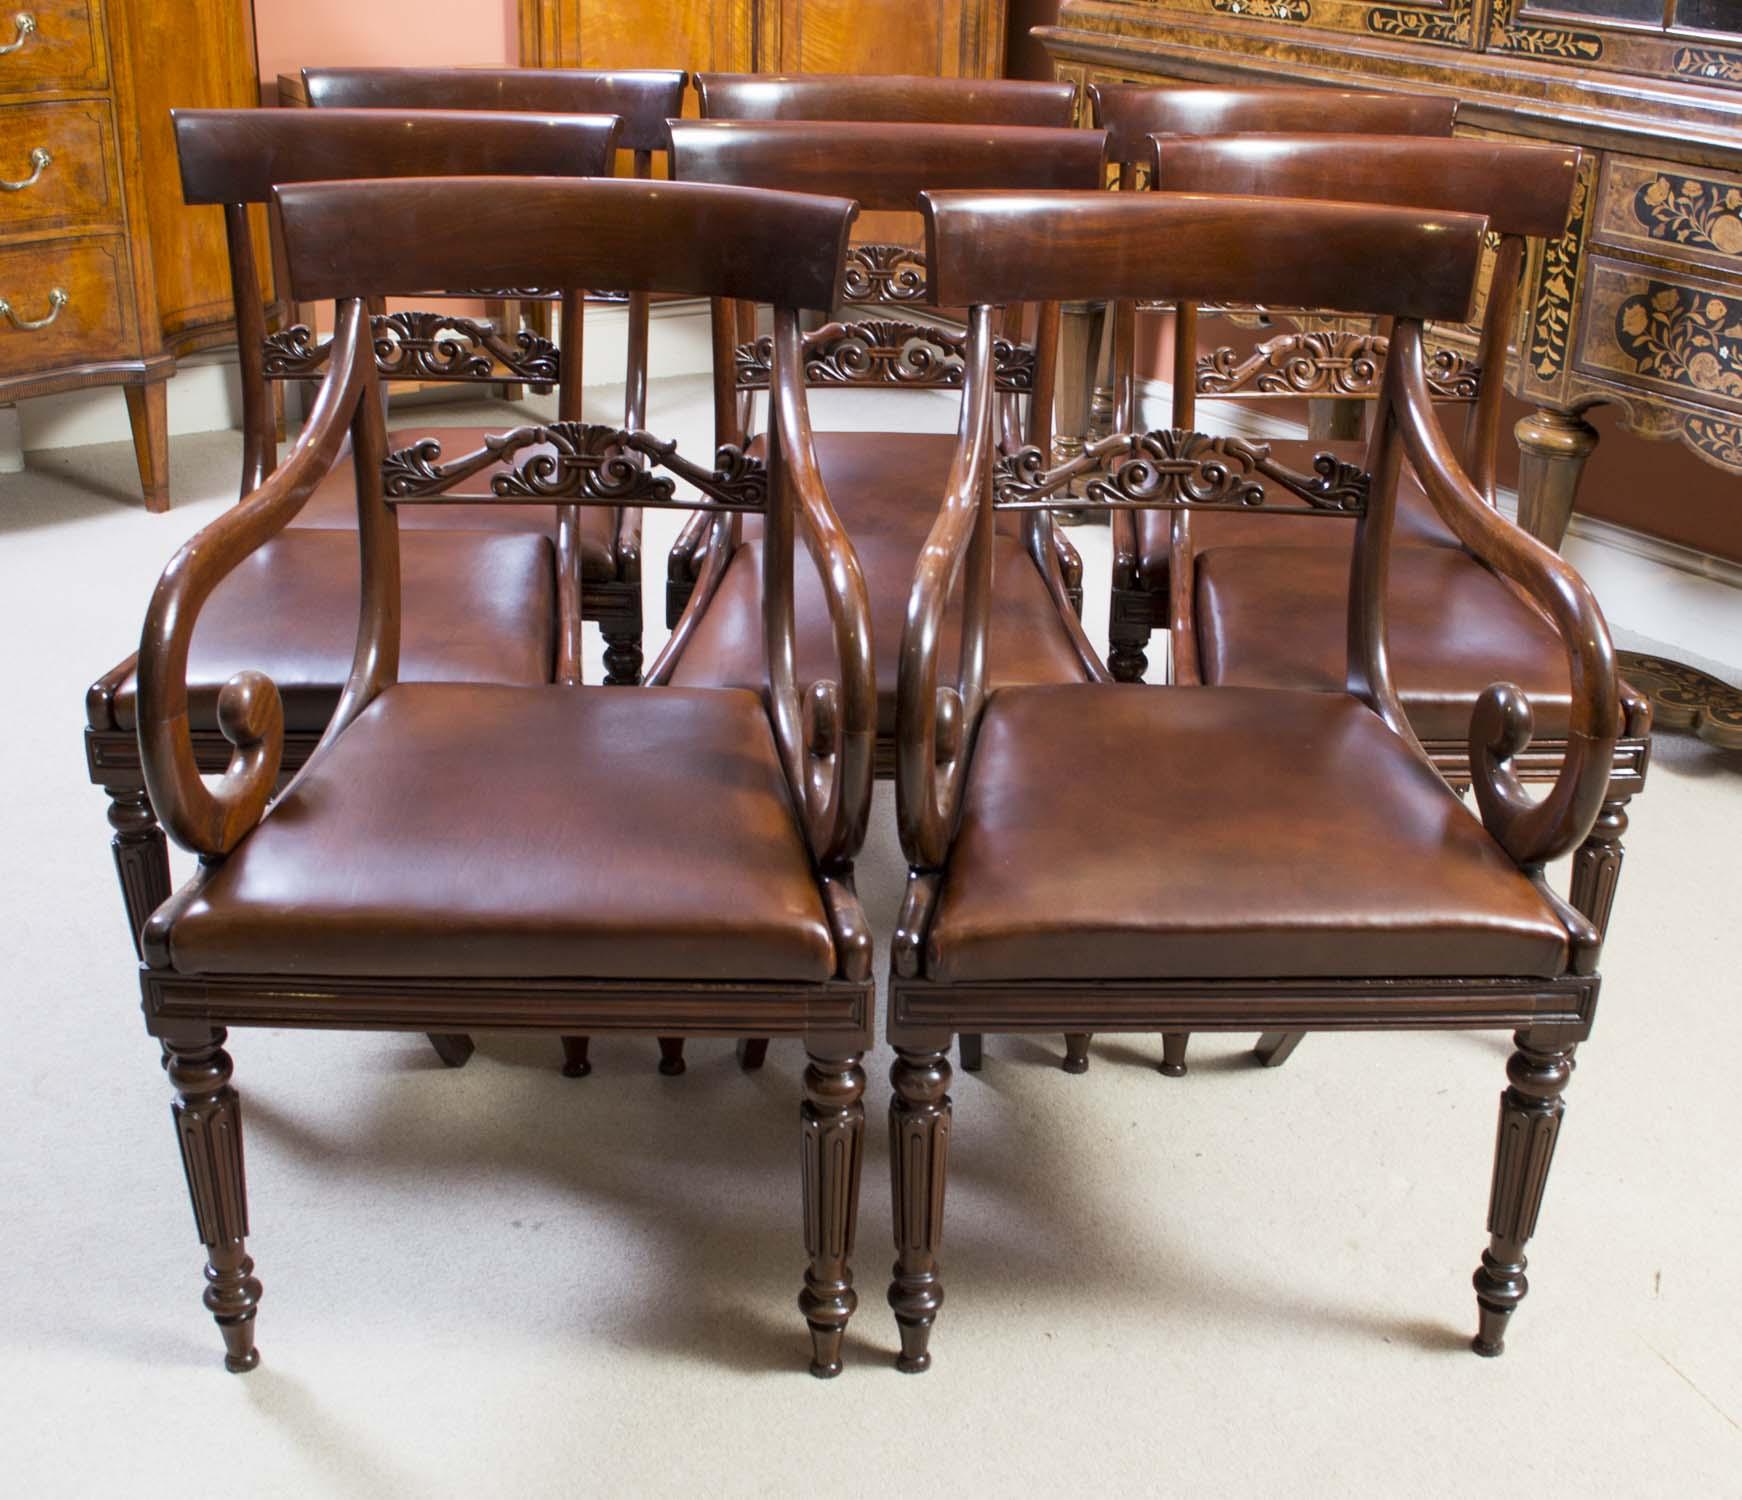 Mahogany Dining Room Furniture: Antique Regency Mahogany